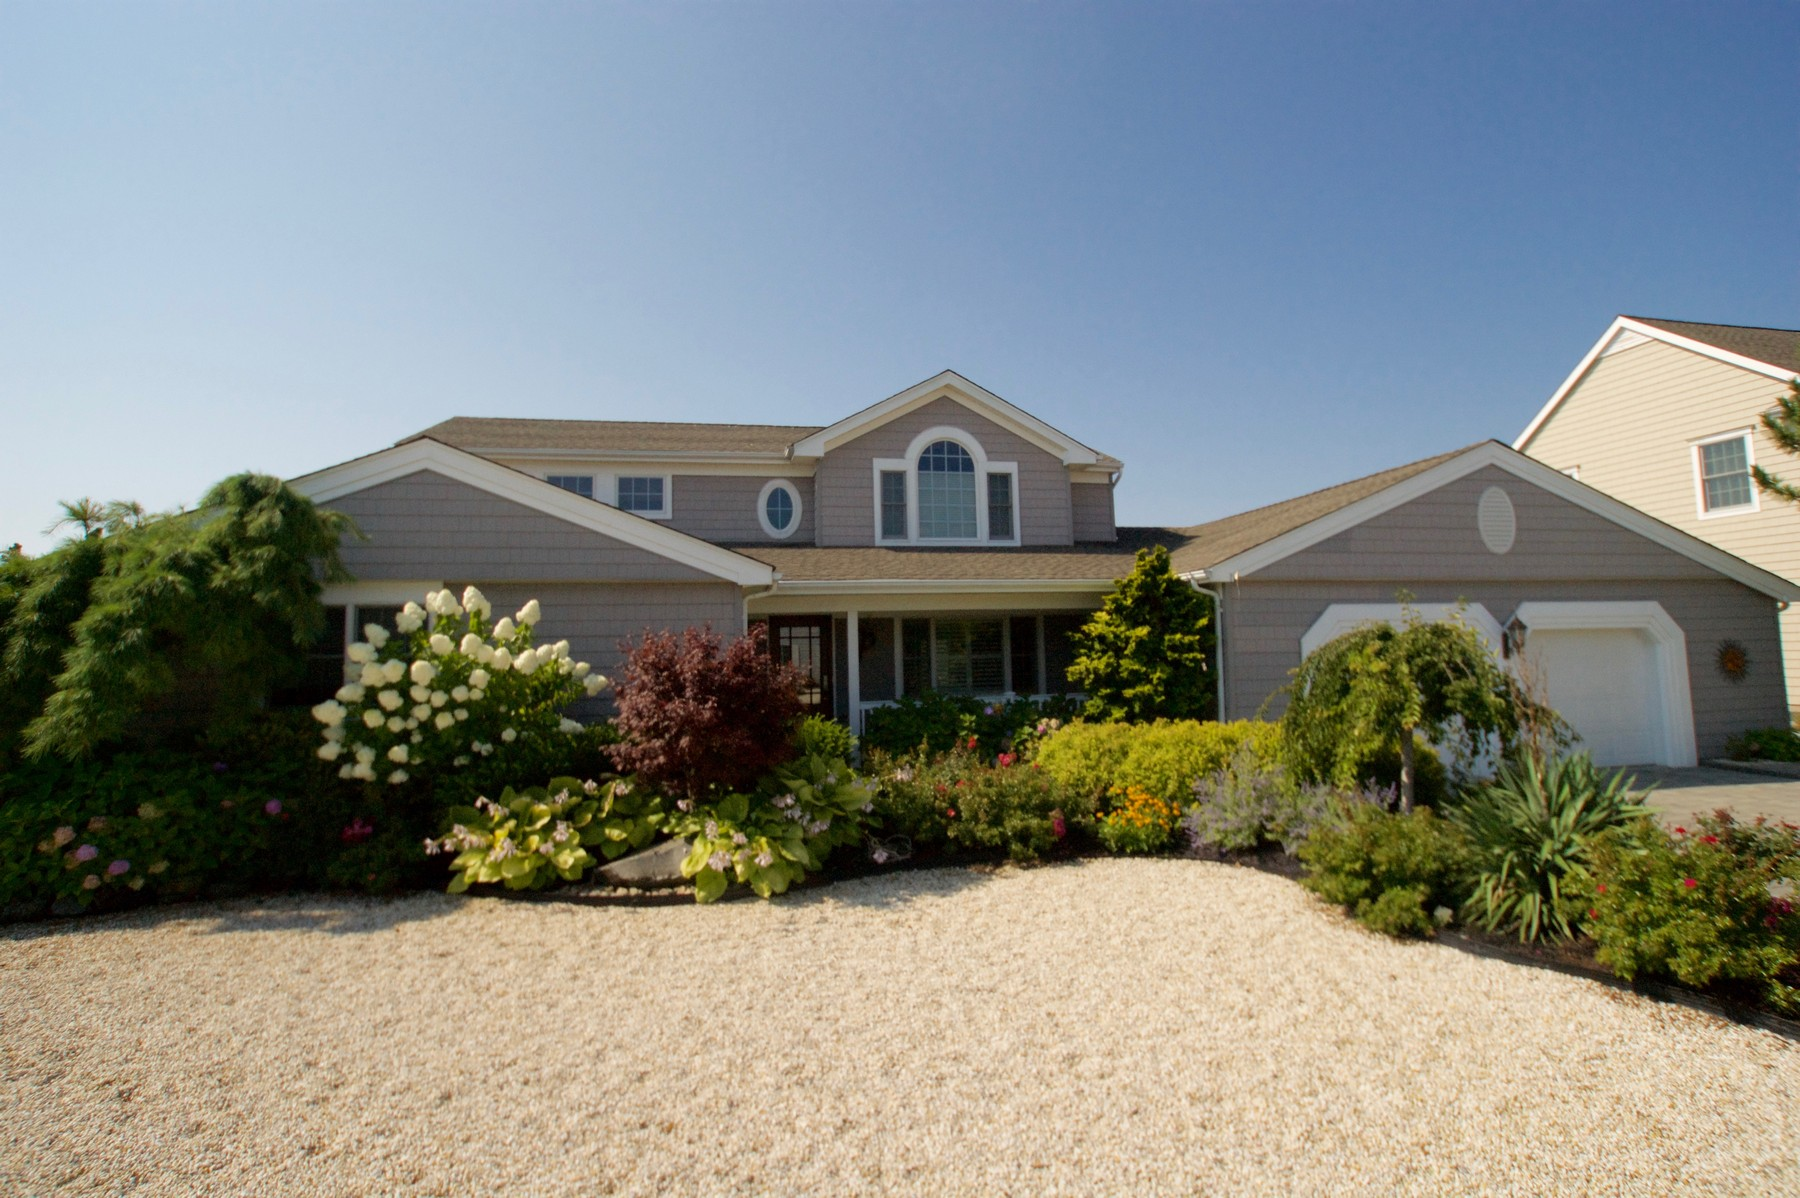 Maison unifamiliale pour l Vente à Located On Open Ended Lagoon With Quick Access To Open Bay 309 Brigantine Lane, Mantoloking, New Jersey 08738 États-Unis